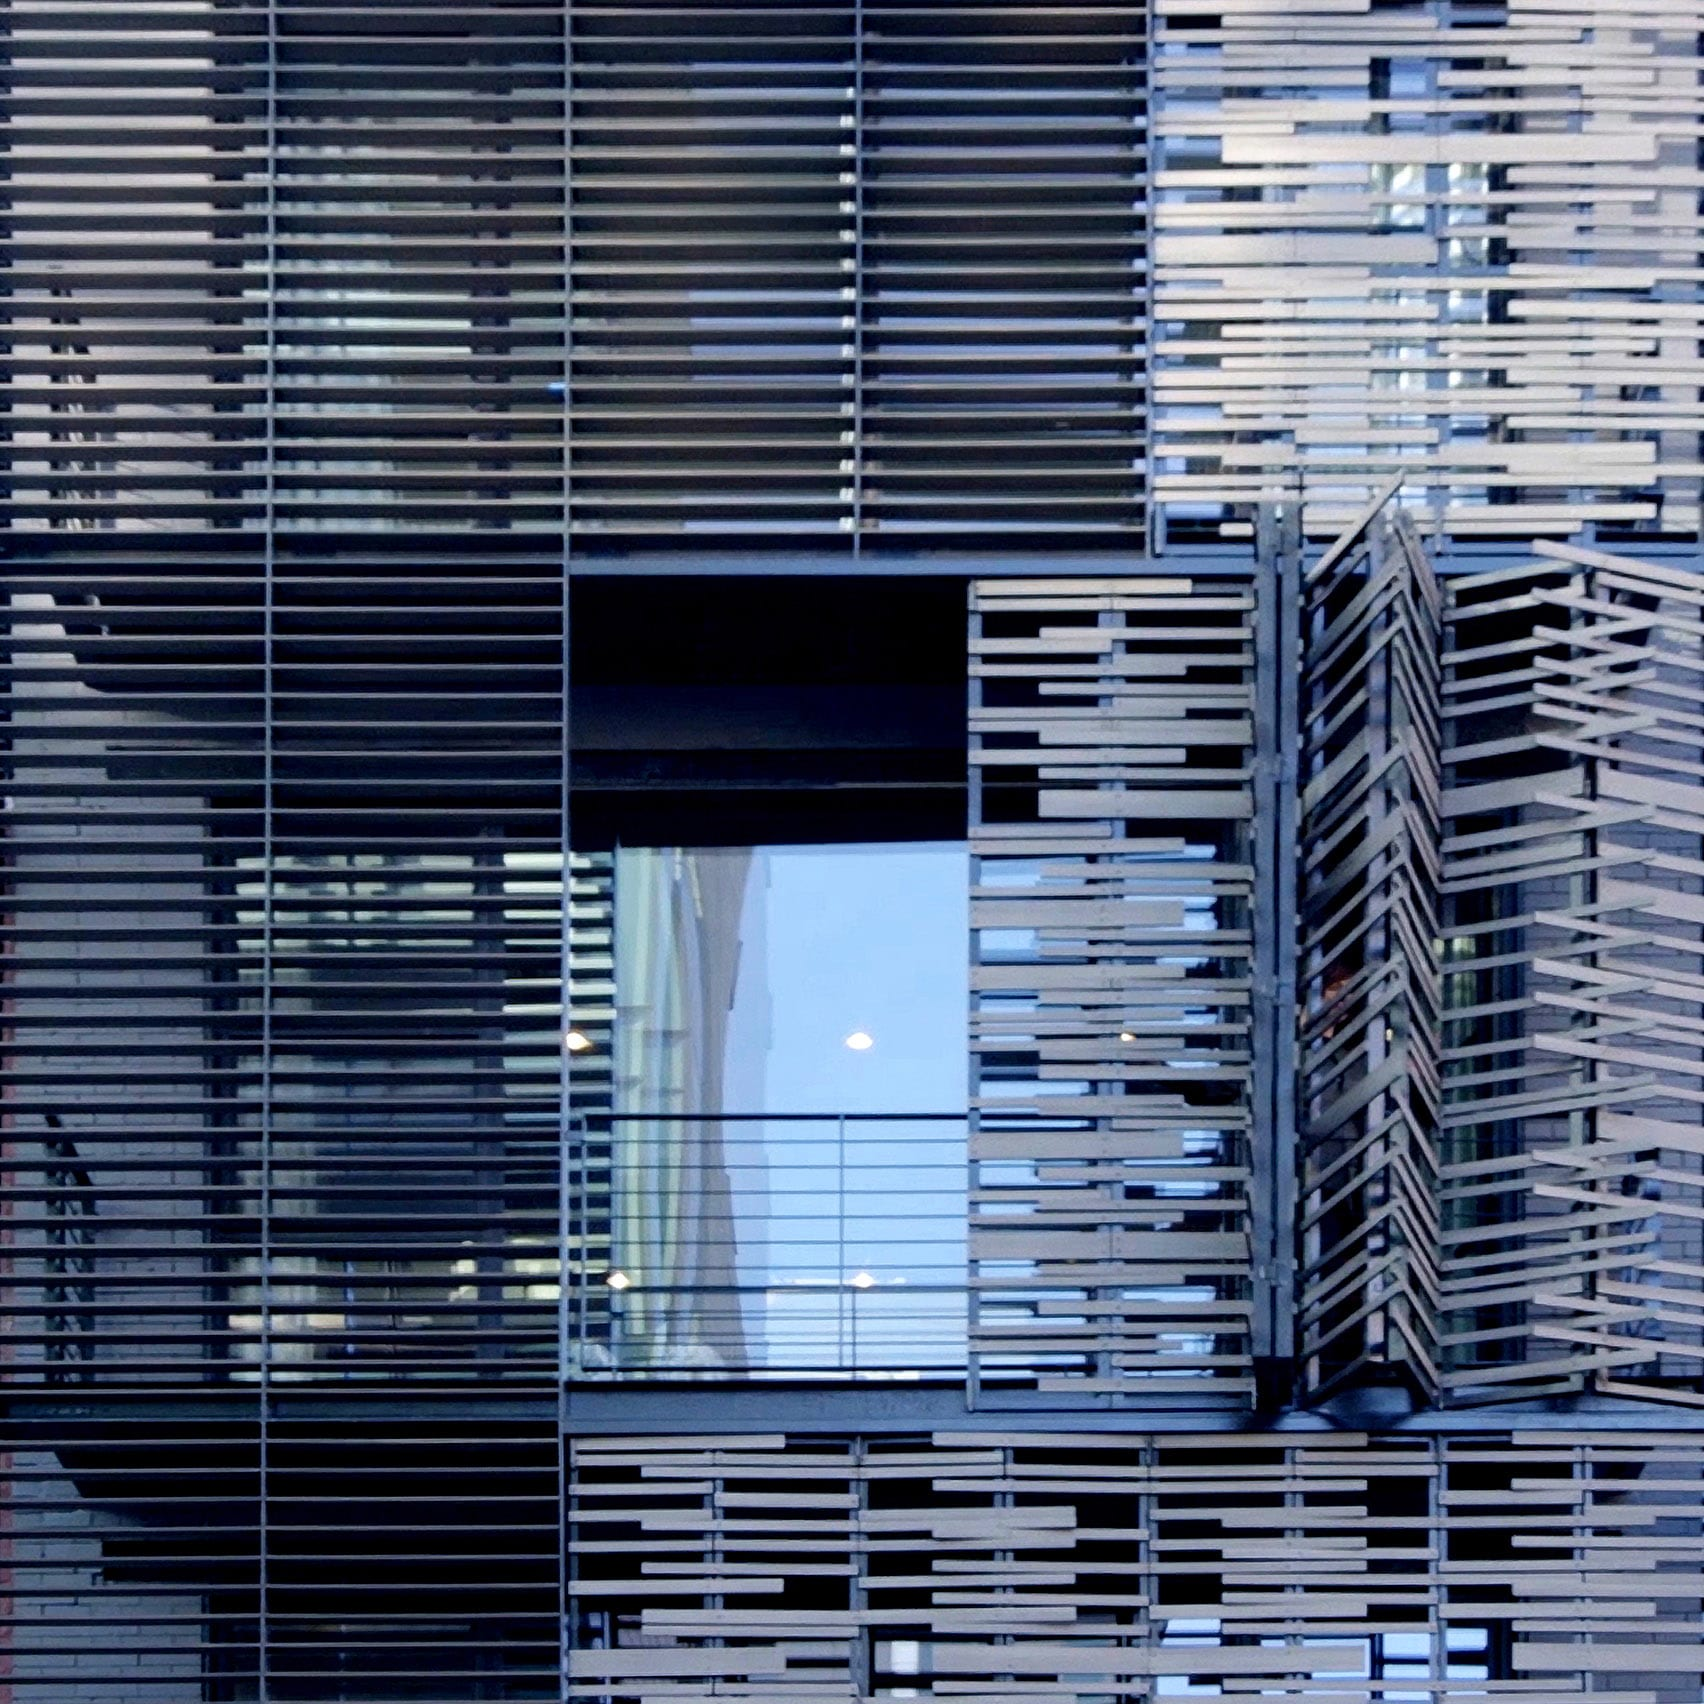 Close-up of folding facade panels